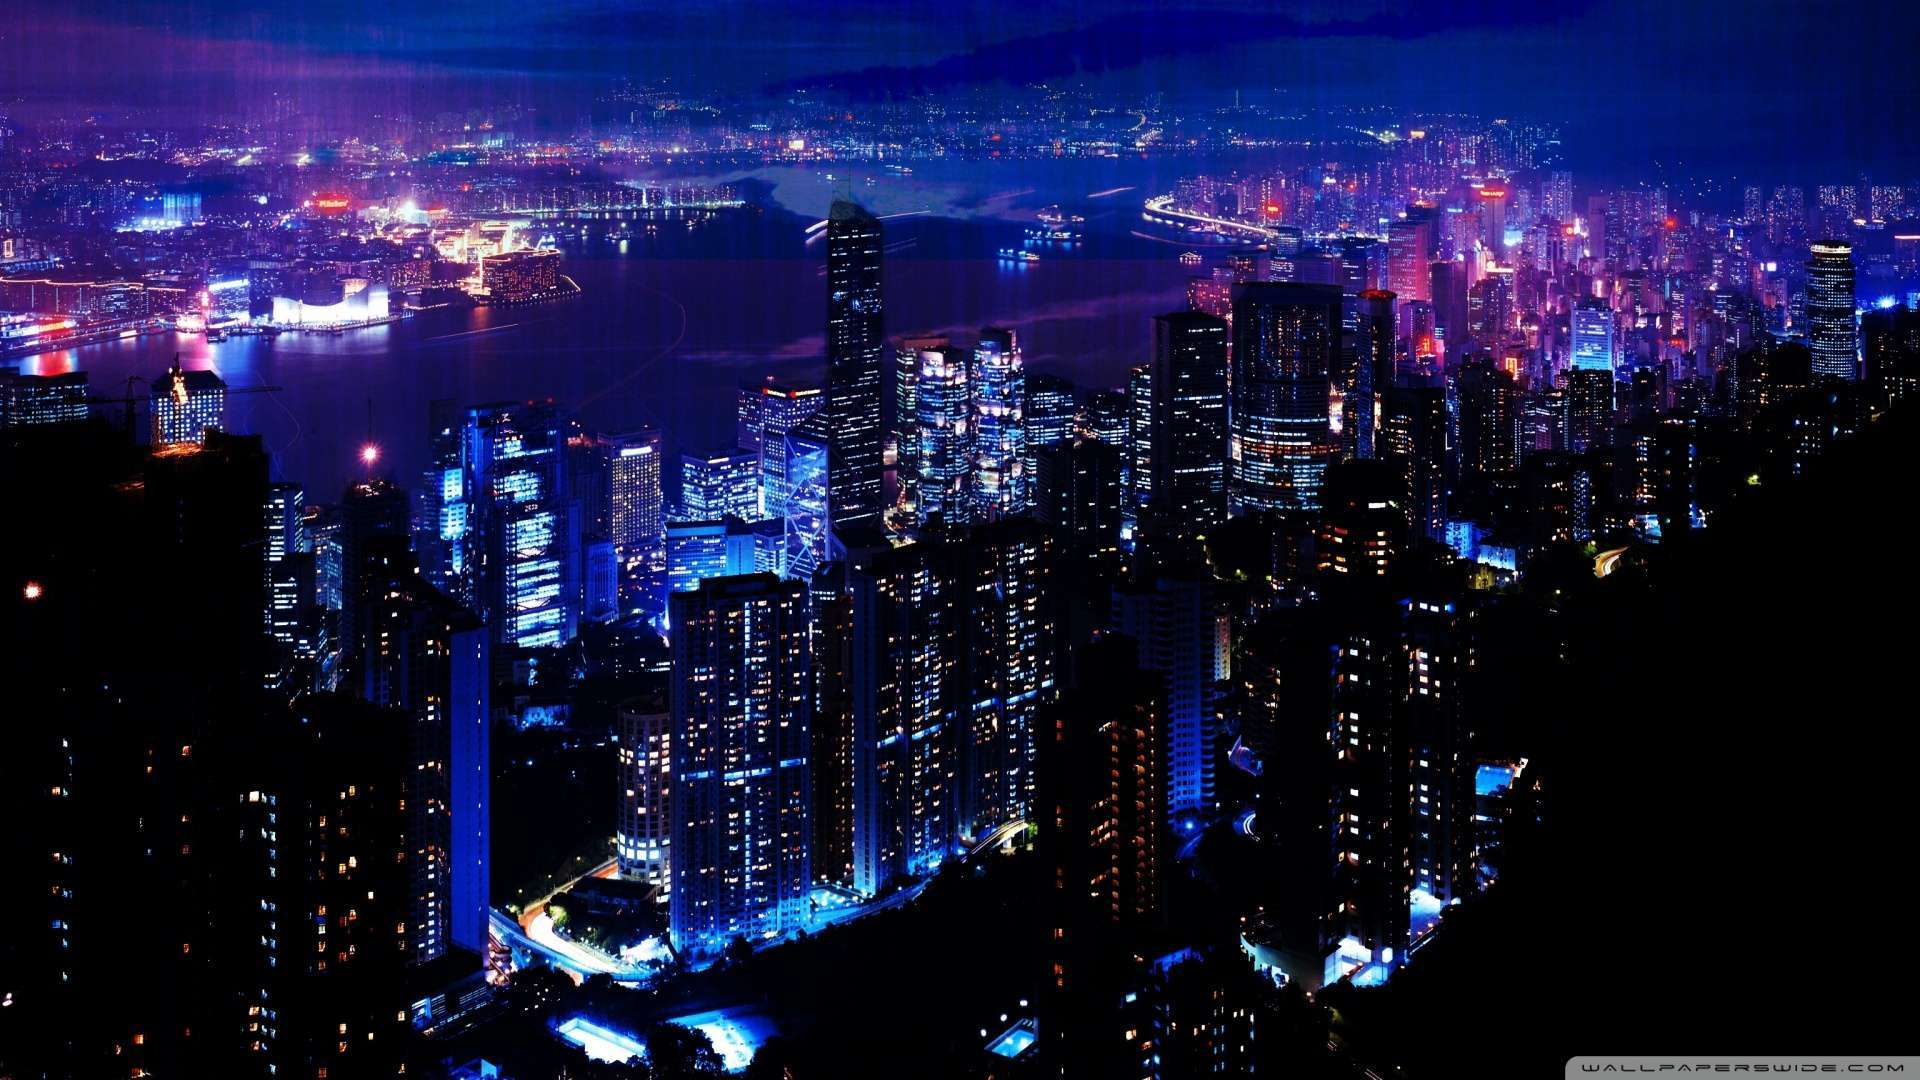 Hd wallpaper upload - Wallpaper Night City 2 Wallpaper 1080p Hd Upload At January 4 2014